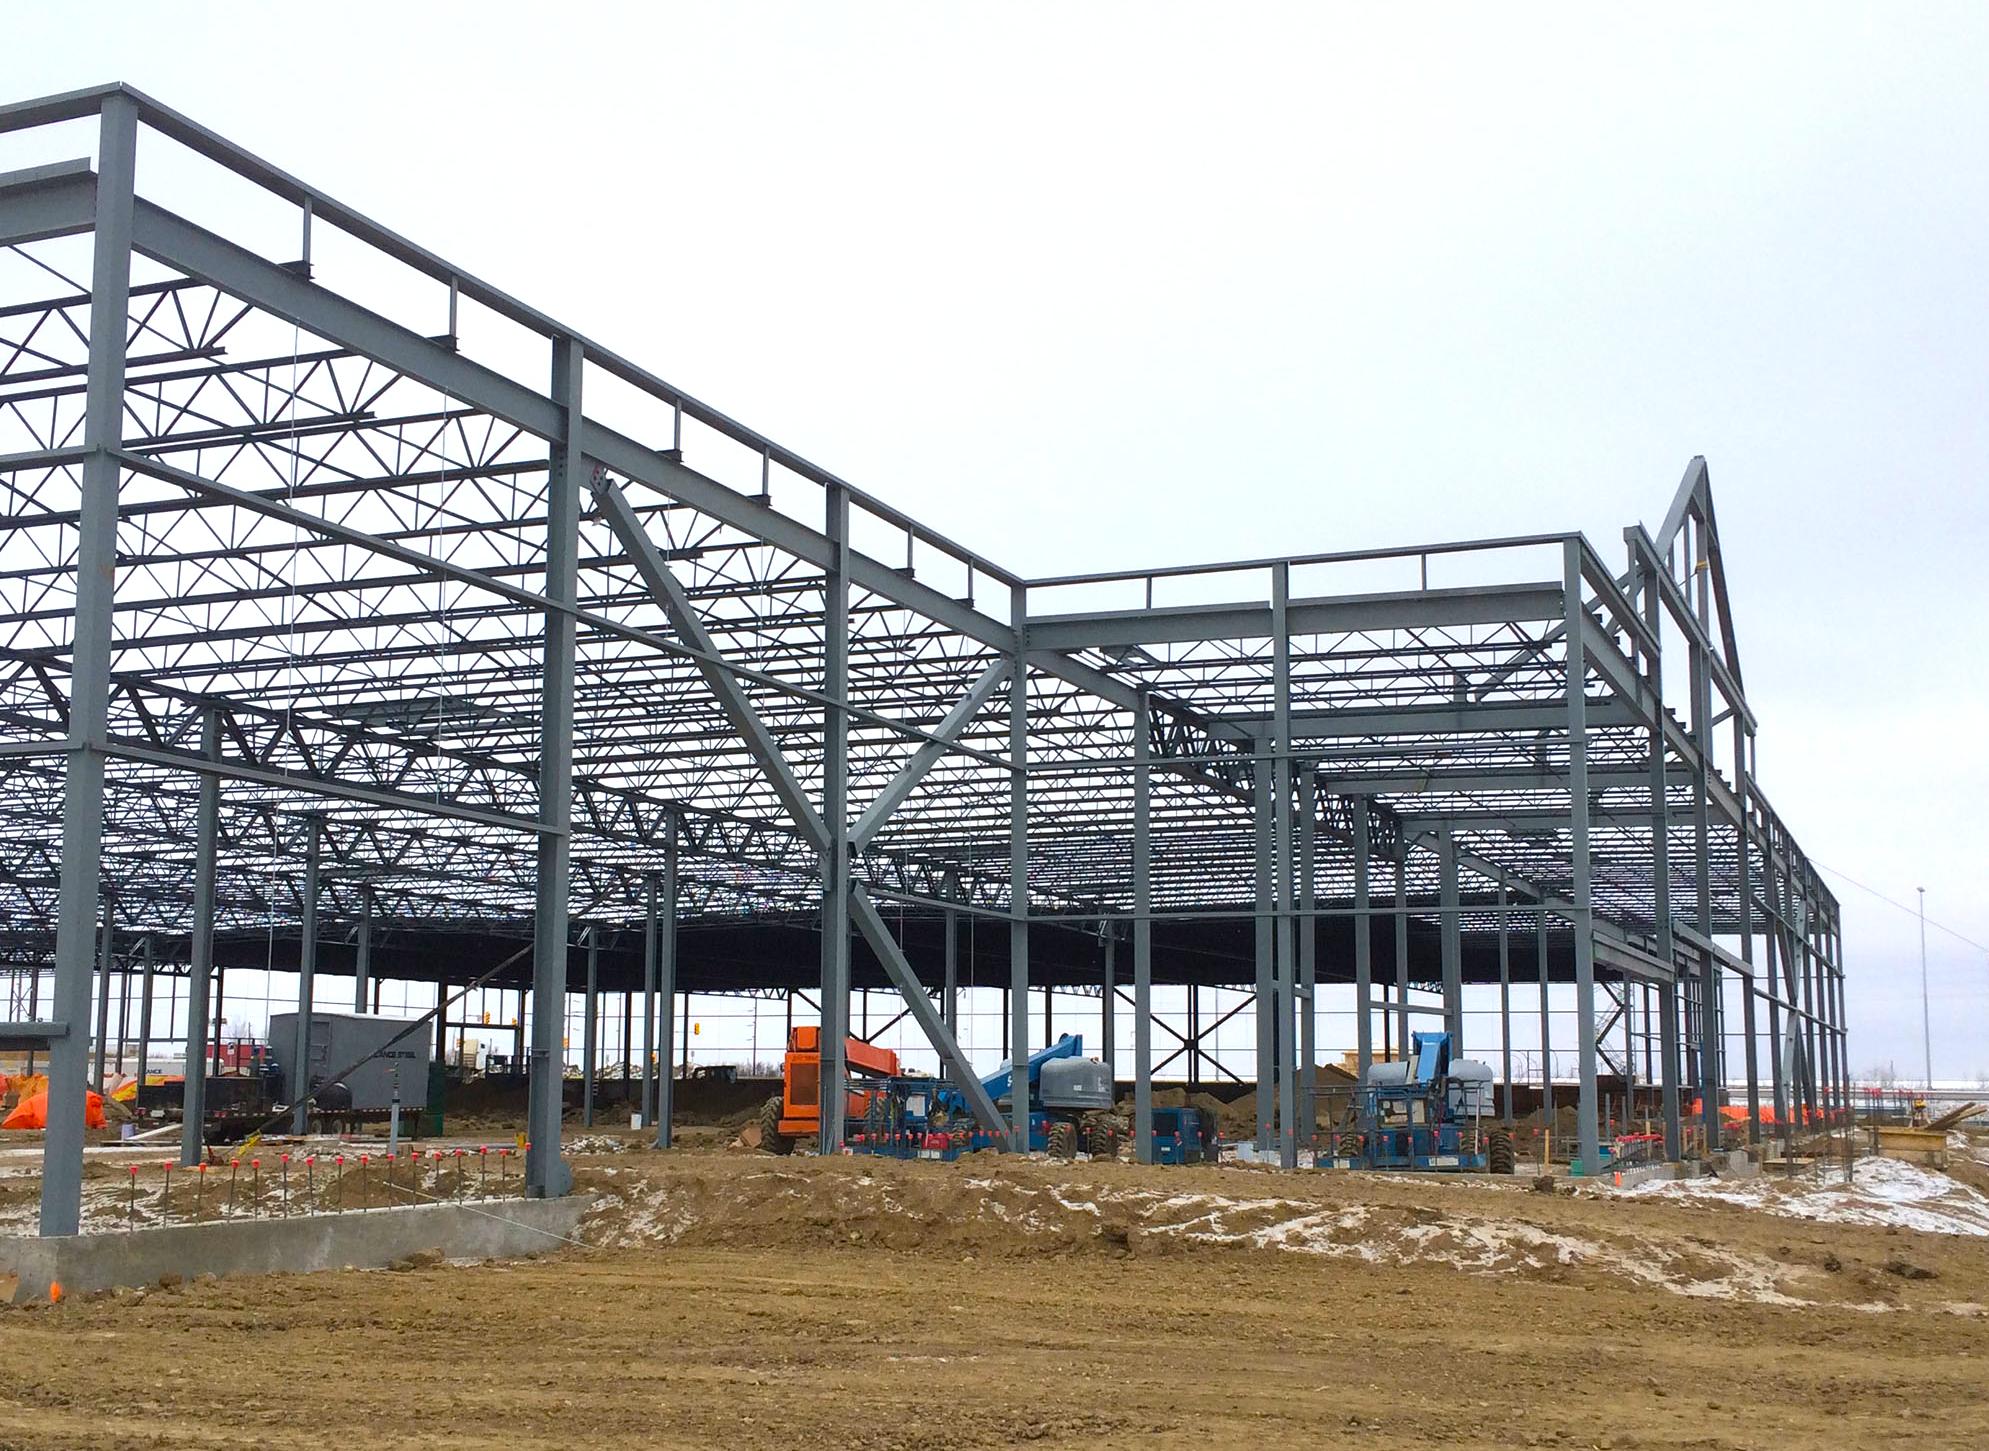 Under construction: Lowe's new Saskatoon location. Photo: Lowe's.